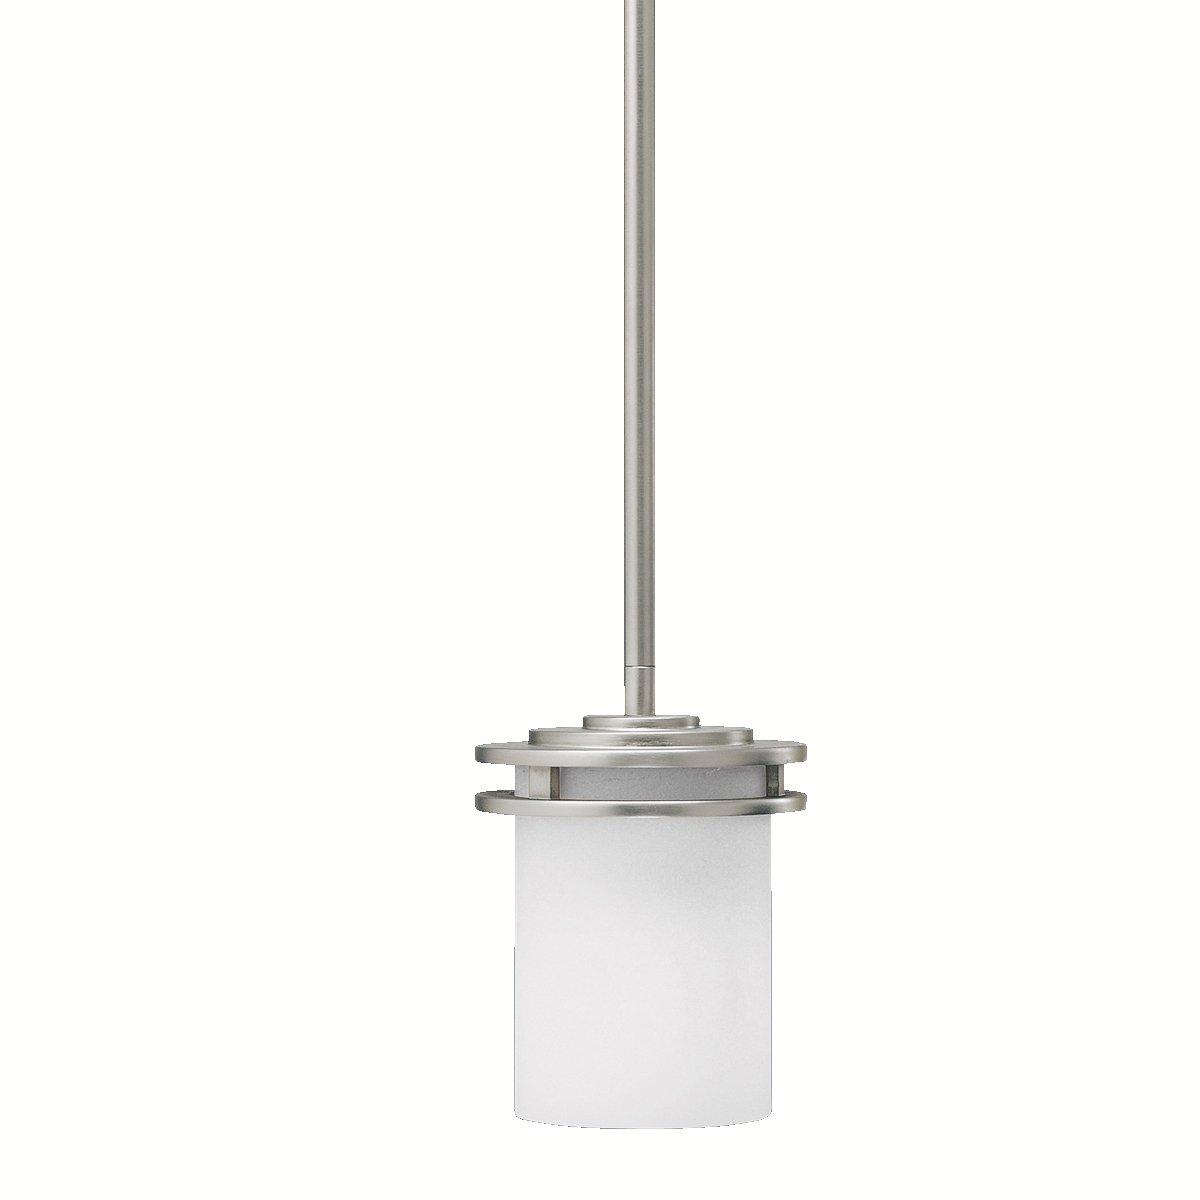 Kichler 3475ni mini pendant 1 light brushed nickel ceiling kichler 3475ni mini pendant 1 light brushed nickel ceiling pendant fixtures amazon aloadofball Images